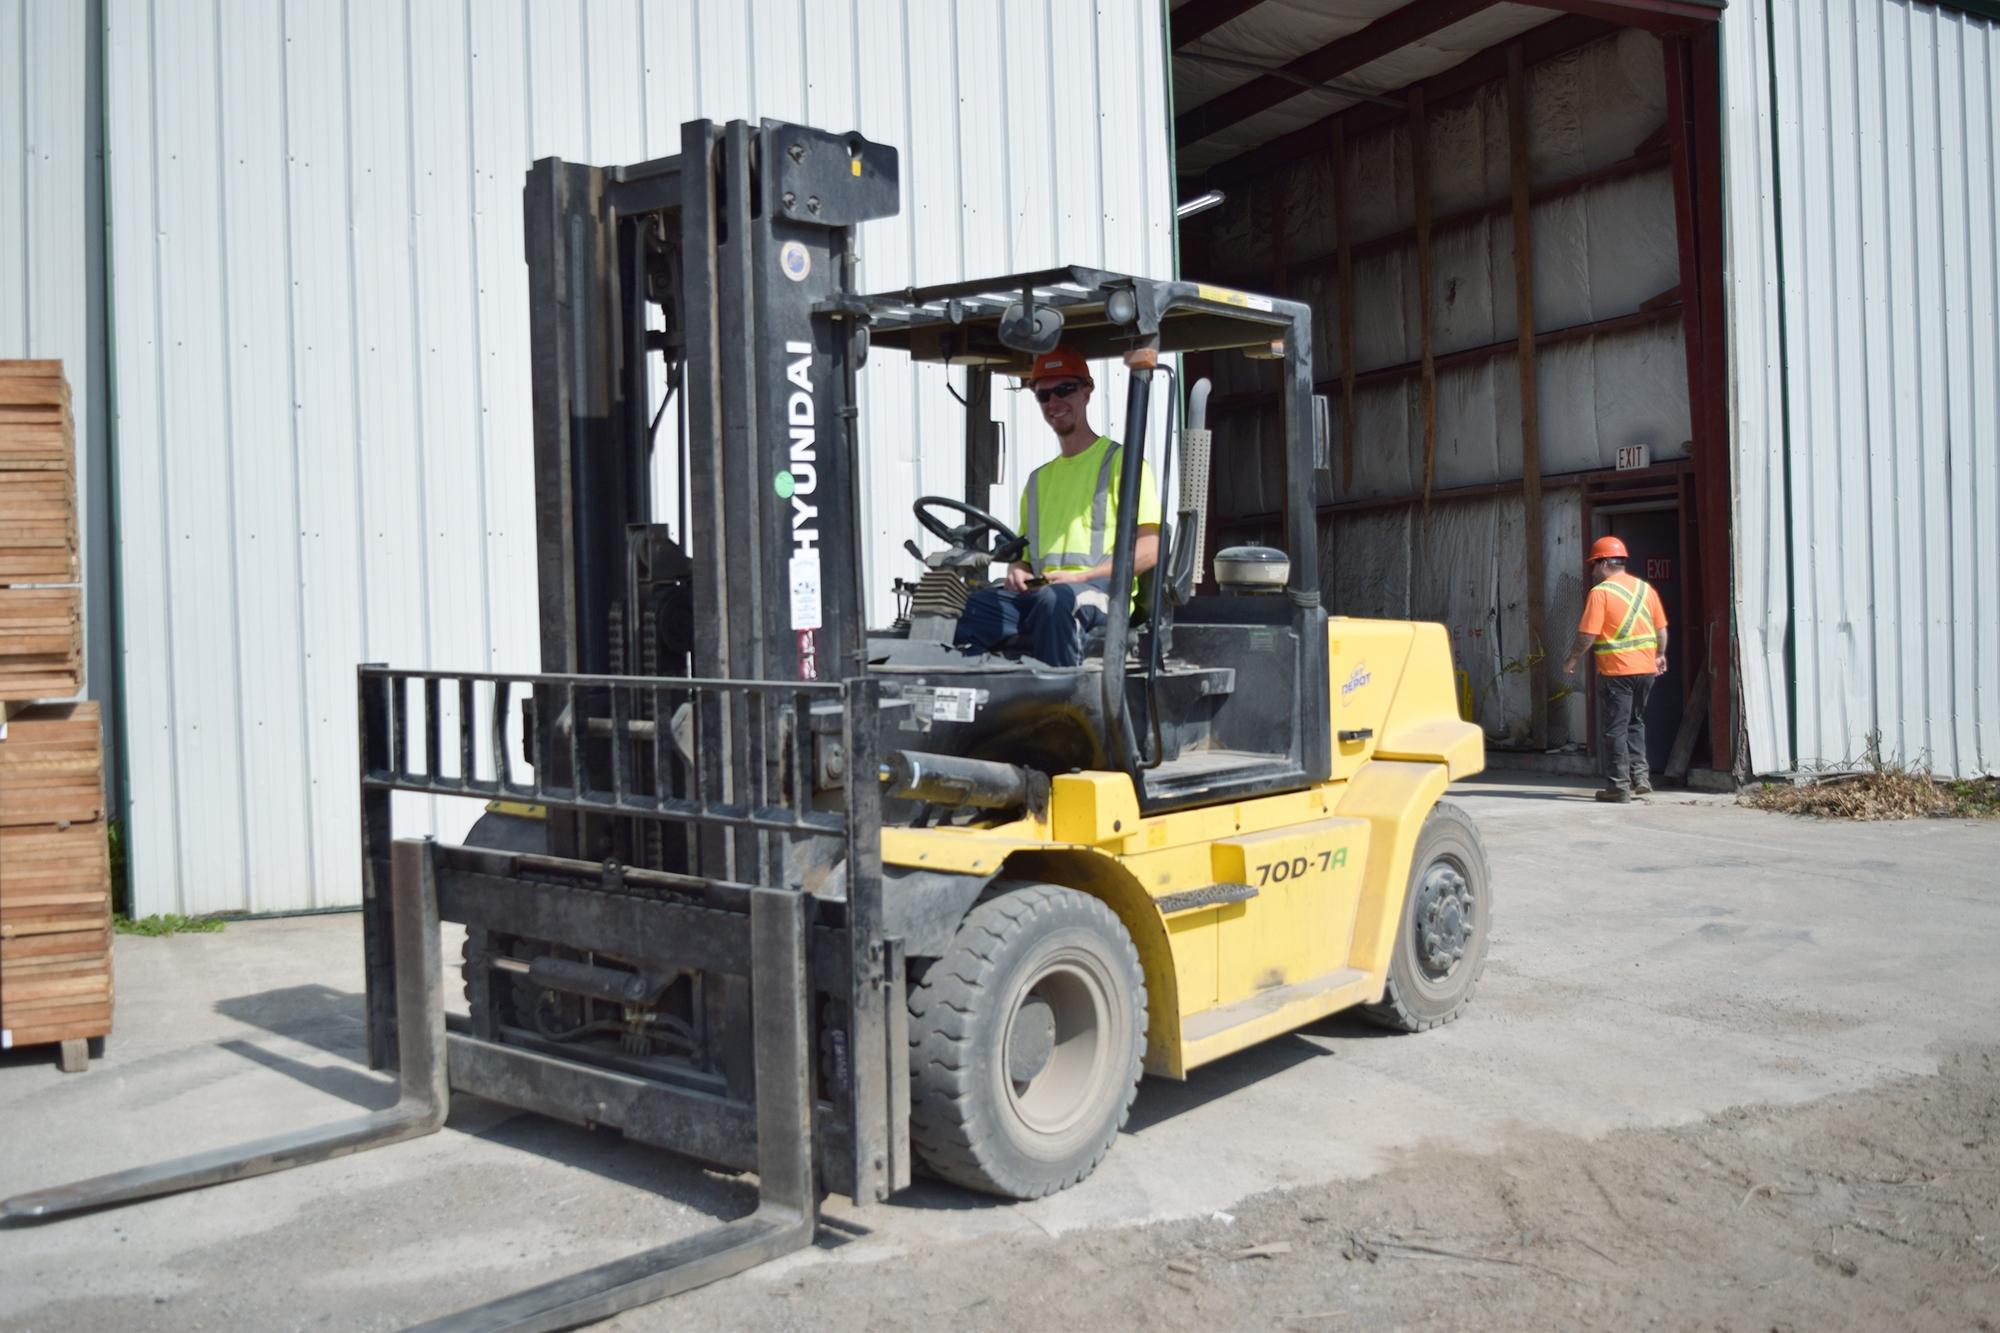 Man in construction uniform driving forklift